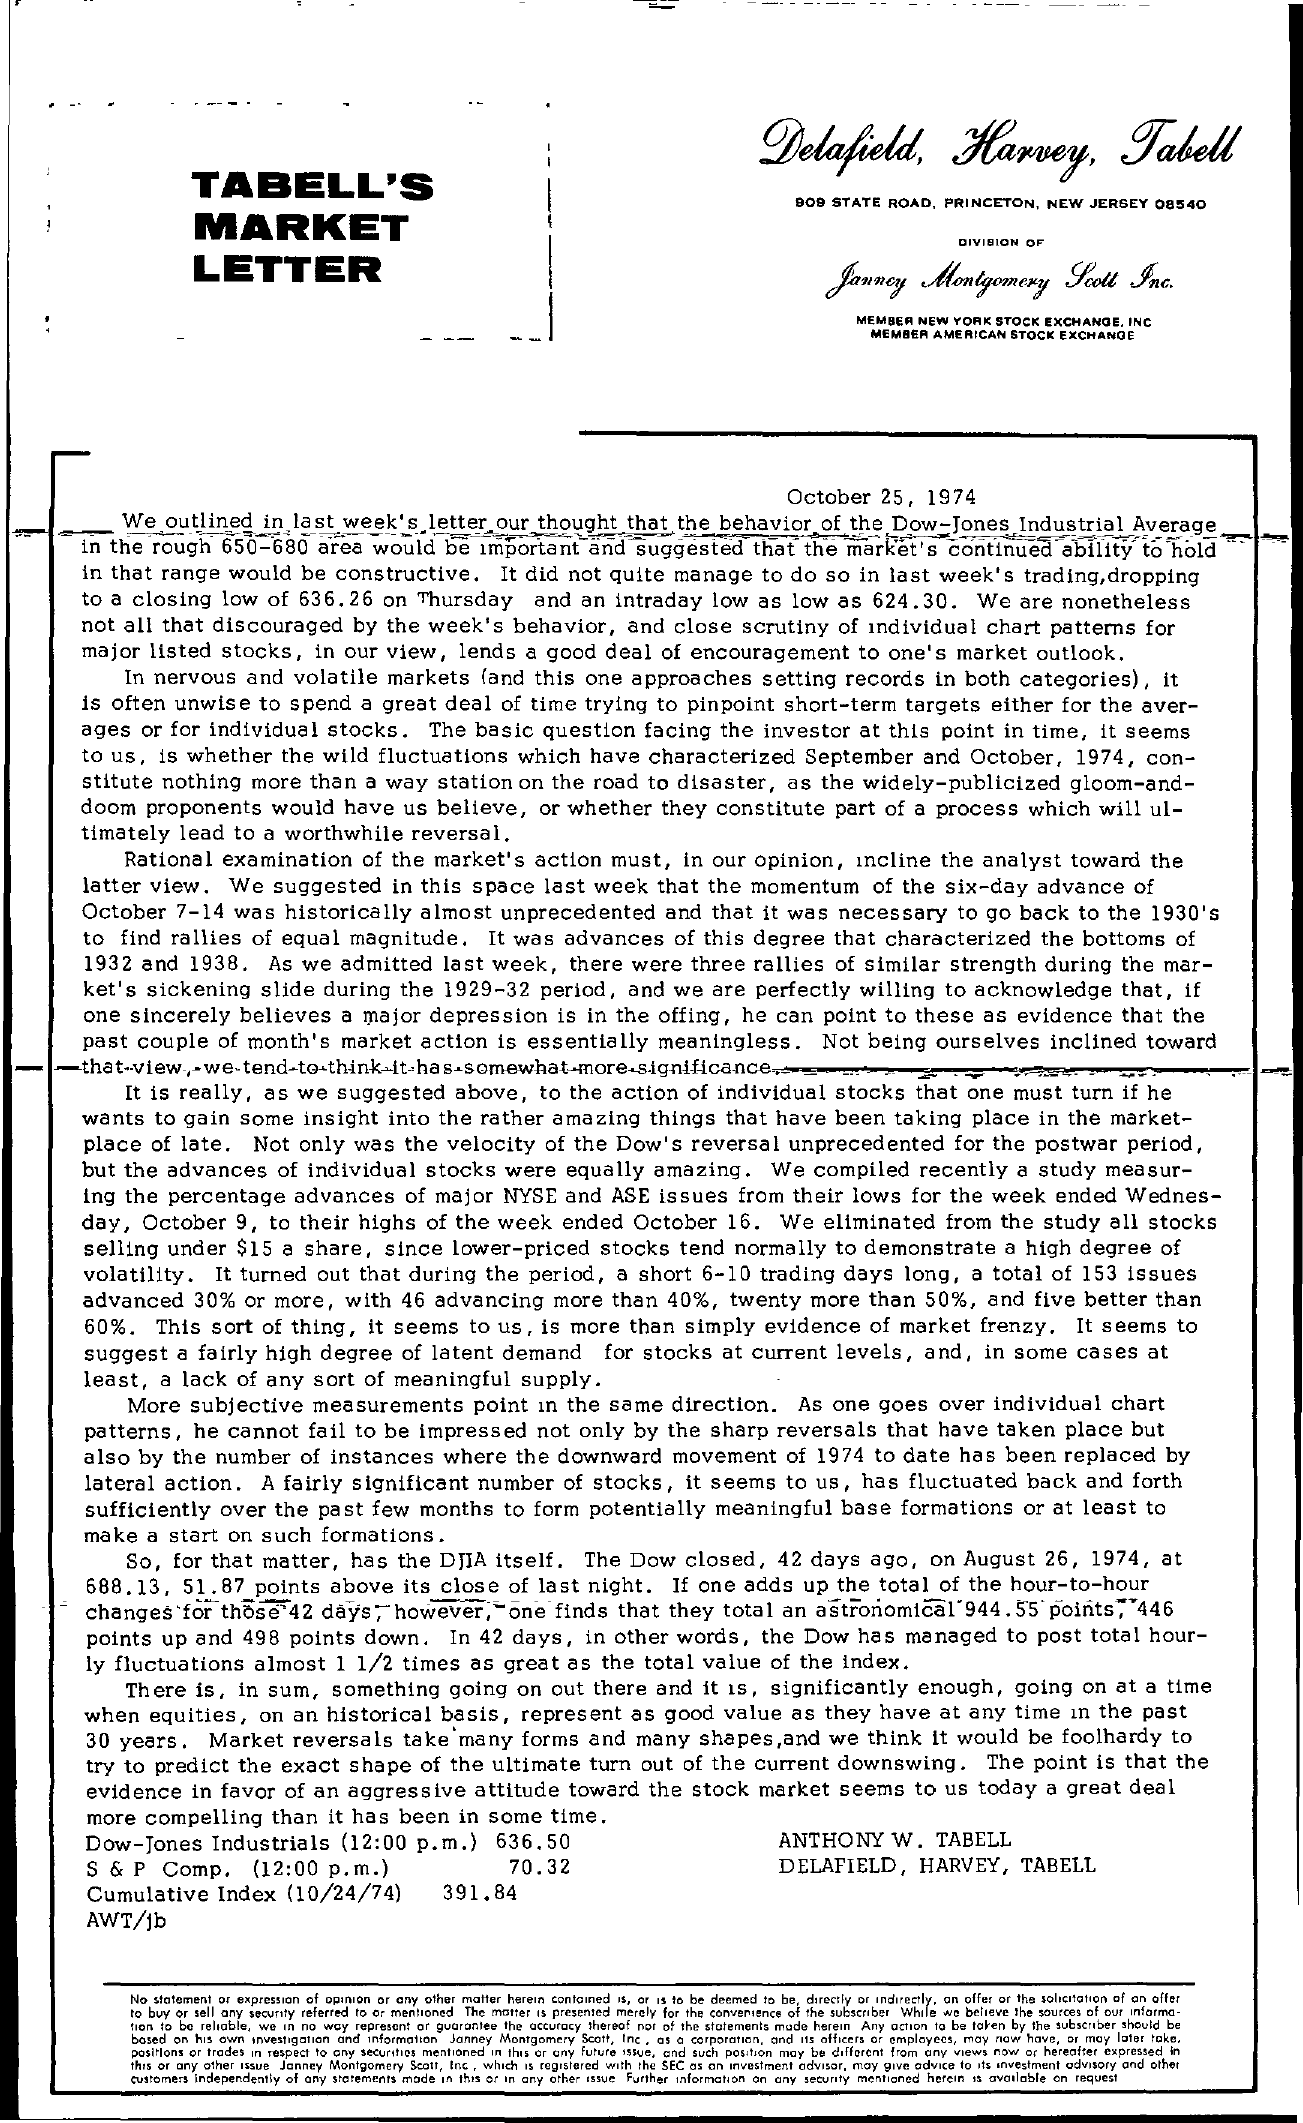 Tabell's Market Letter - October 25, 1974